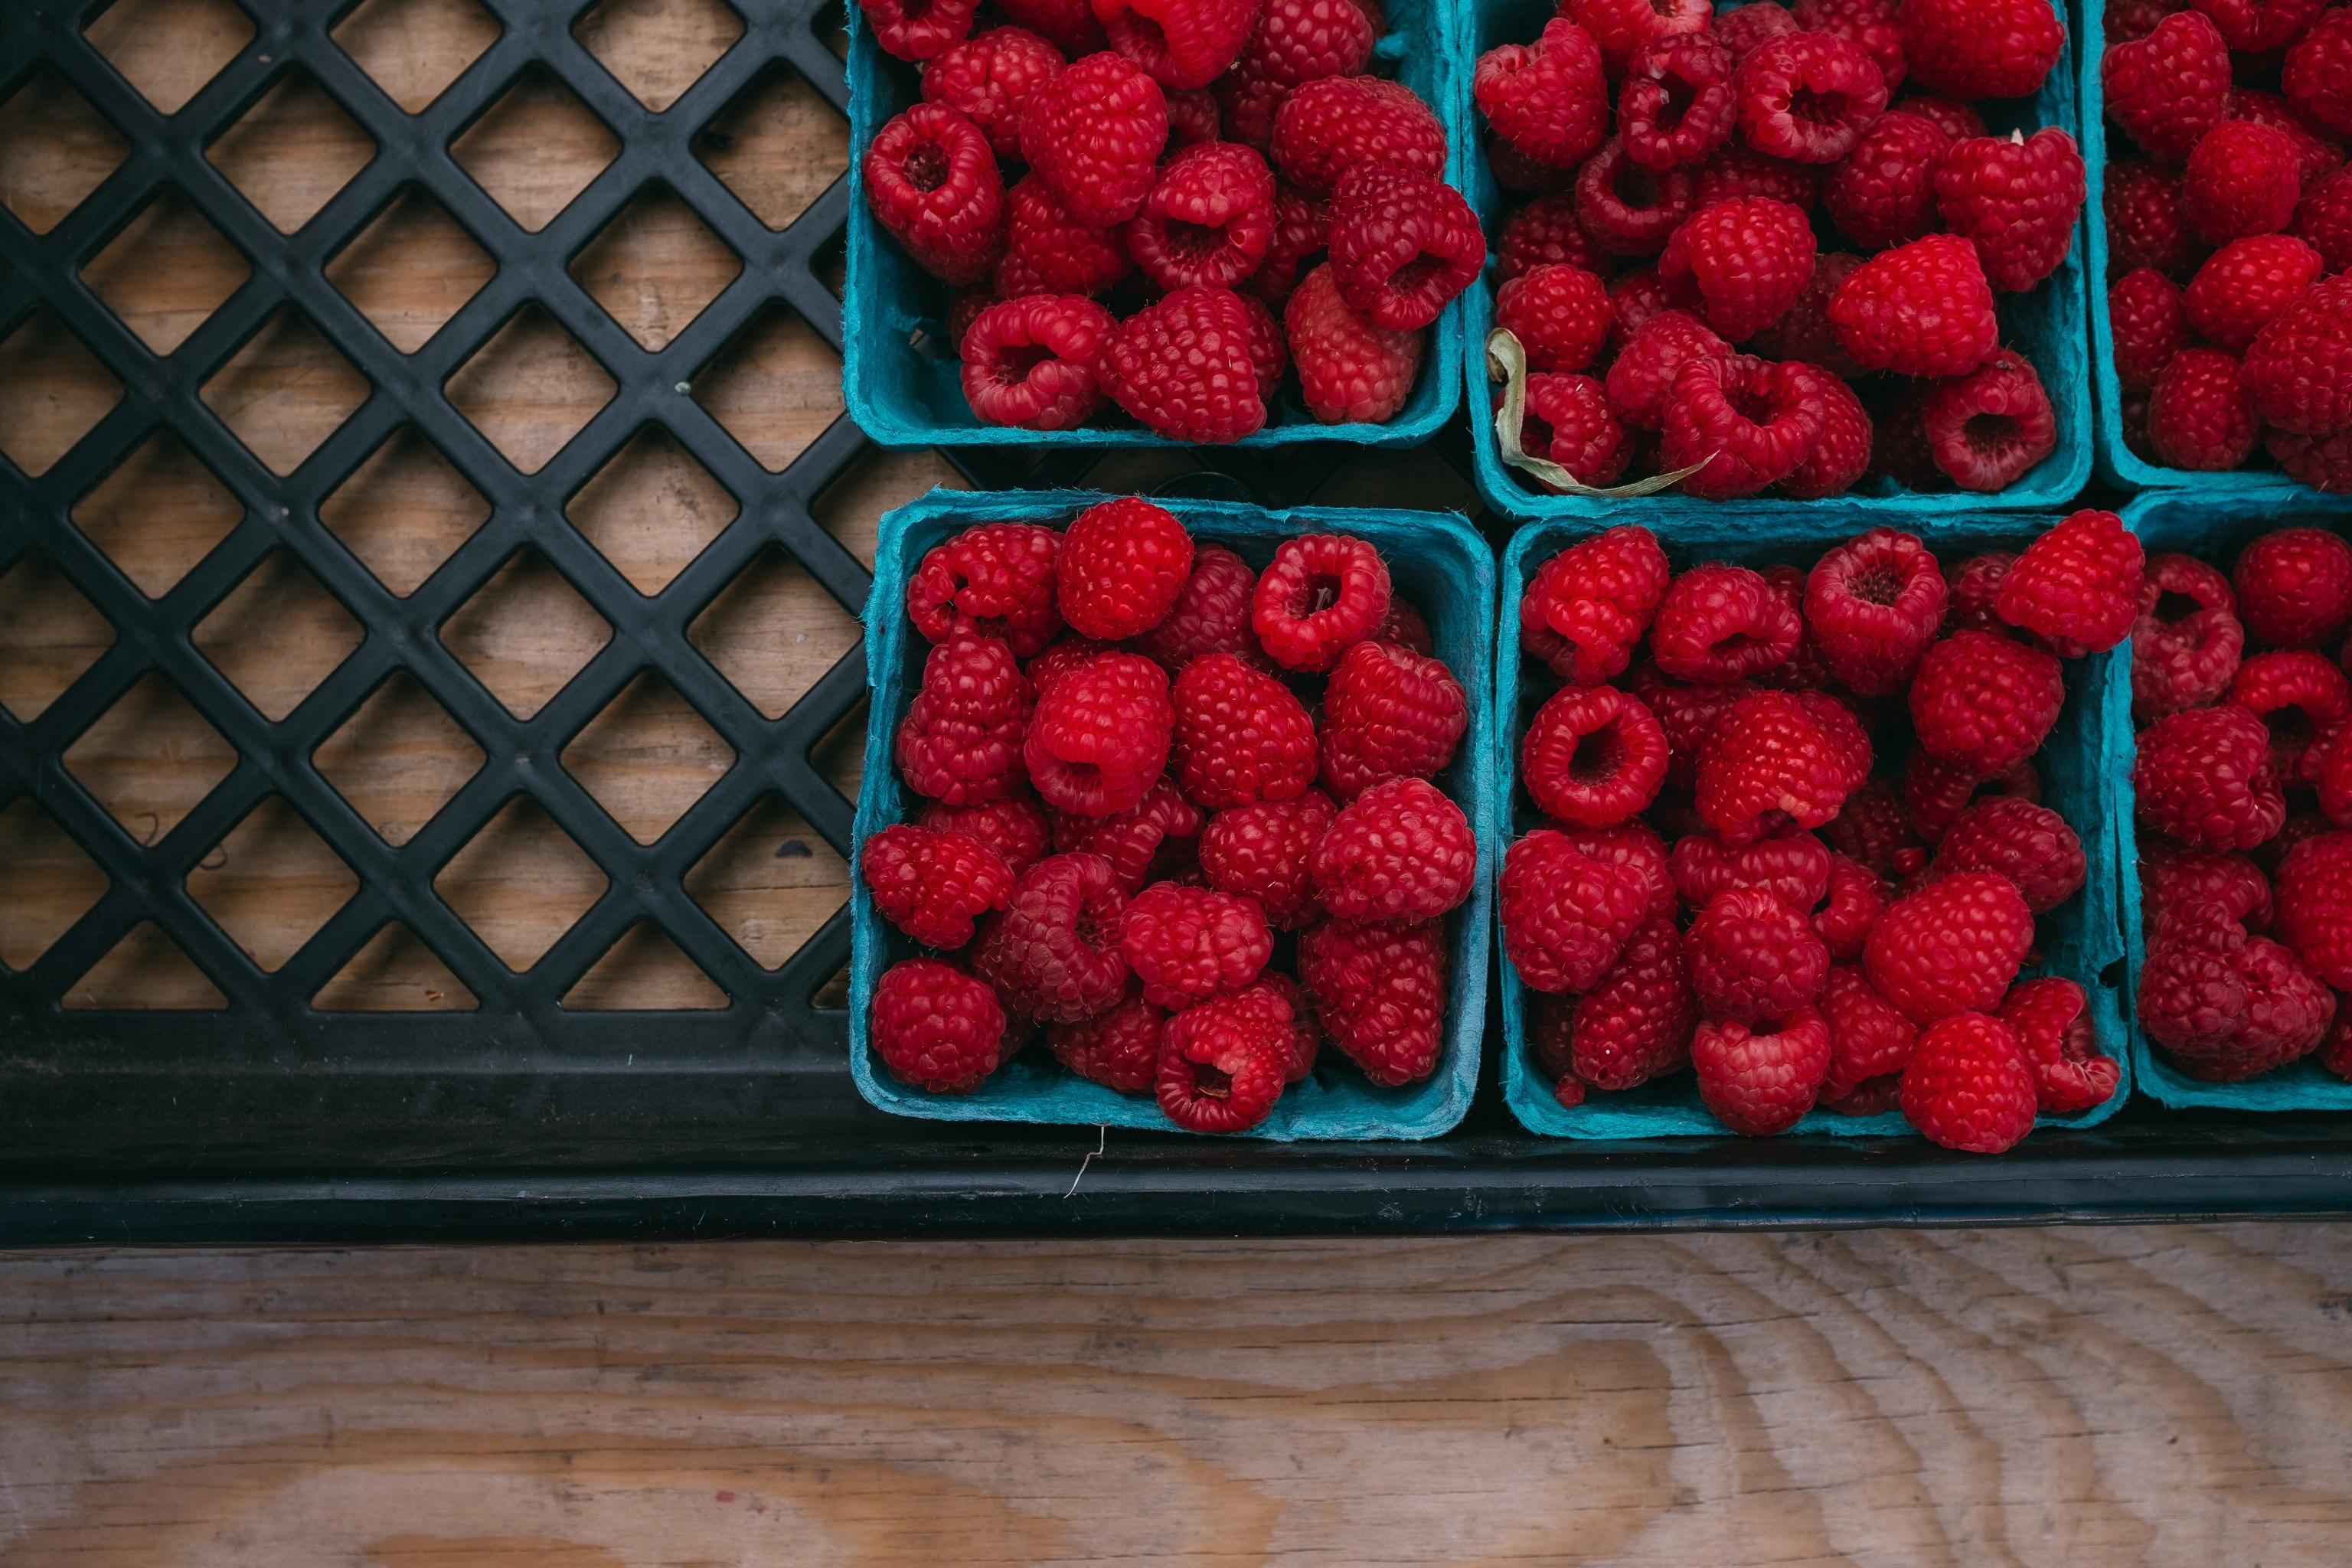 10 Health Benefits: What Secrets Do Watermelons Keep?